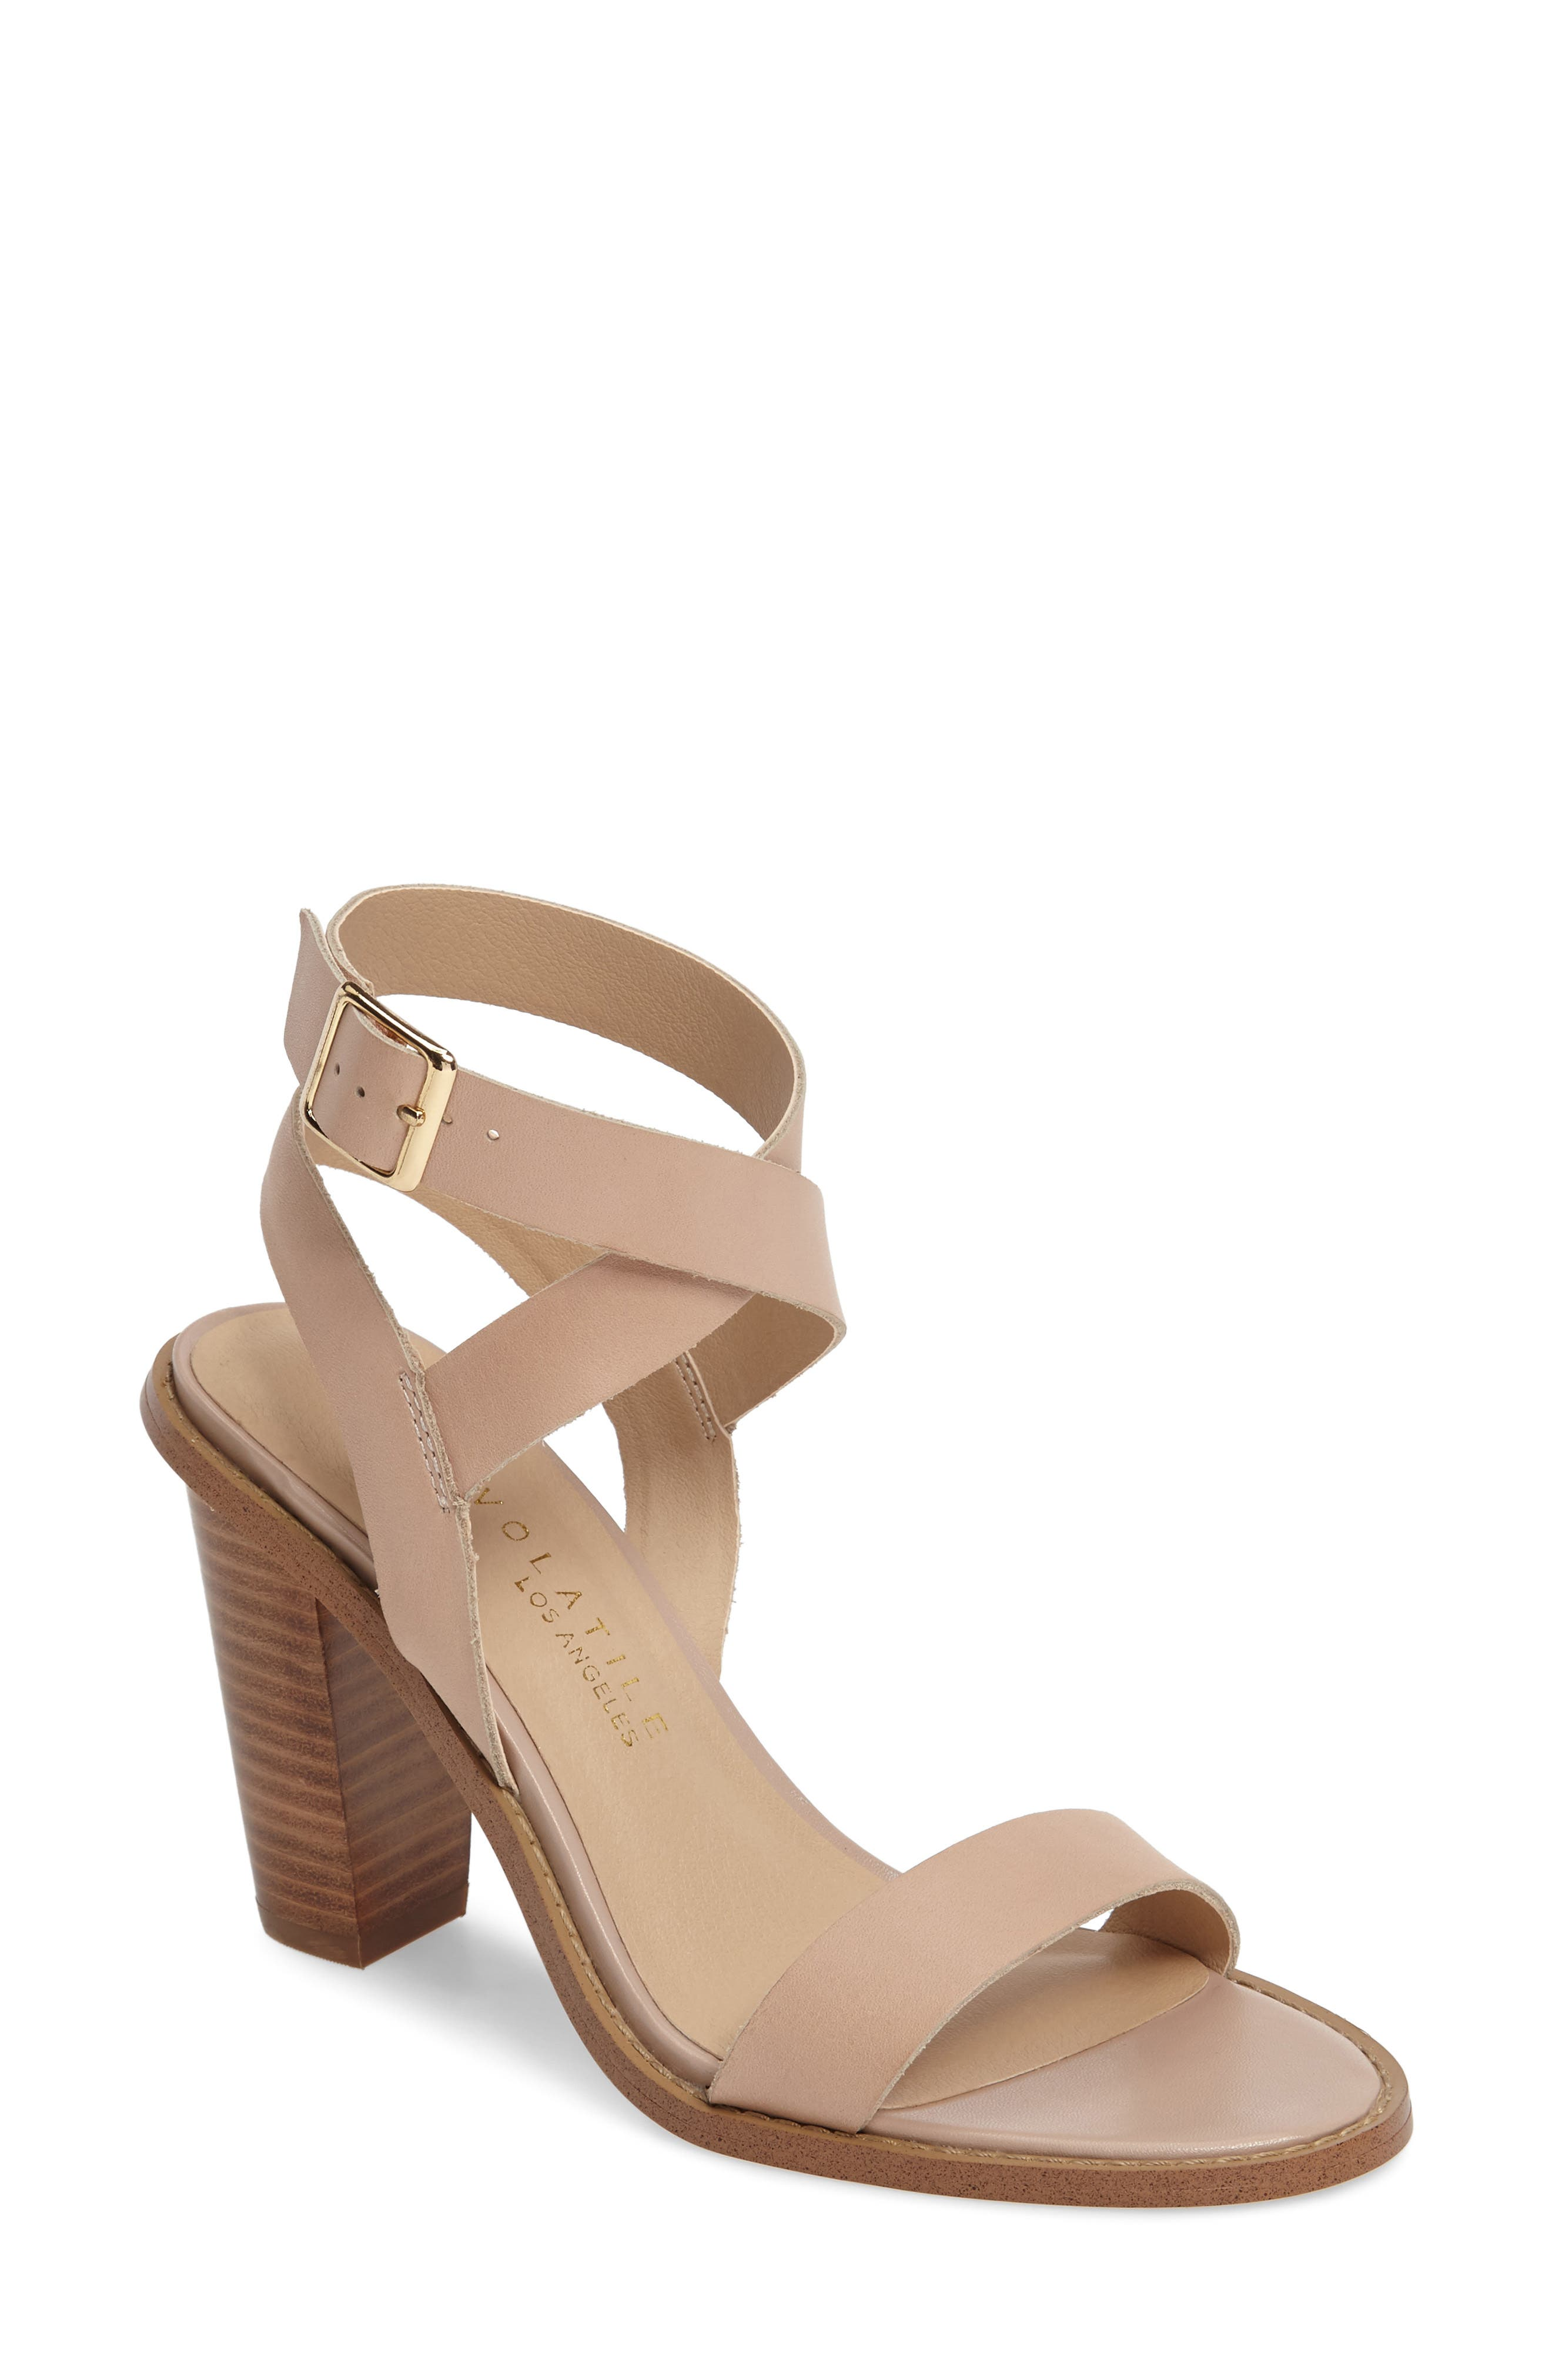 Main Image - Very Volatile Poshy Ankle Wrap Sandal (Women)